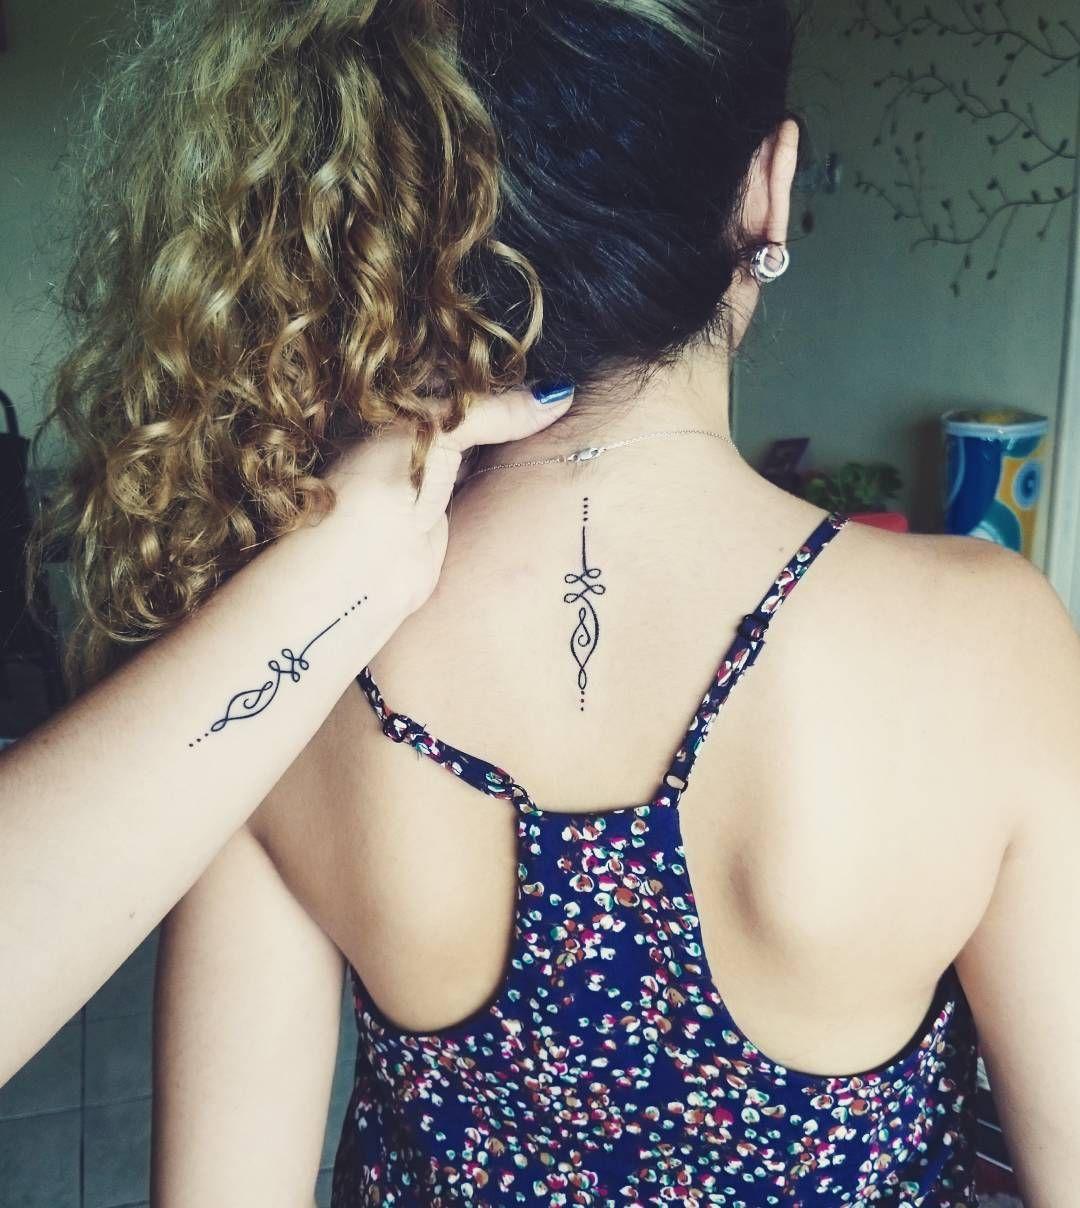 Ideas Y Disenos De Tatuajes Para Madre E Hija Que Las Unira Tatuaje Madre E Hija Tatuaje Mama E Hija Tatuaje Unalome